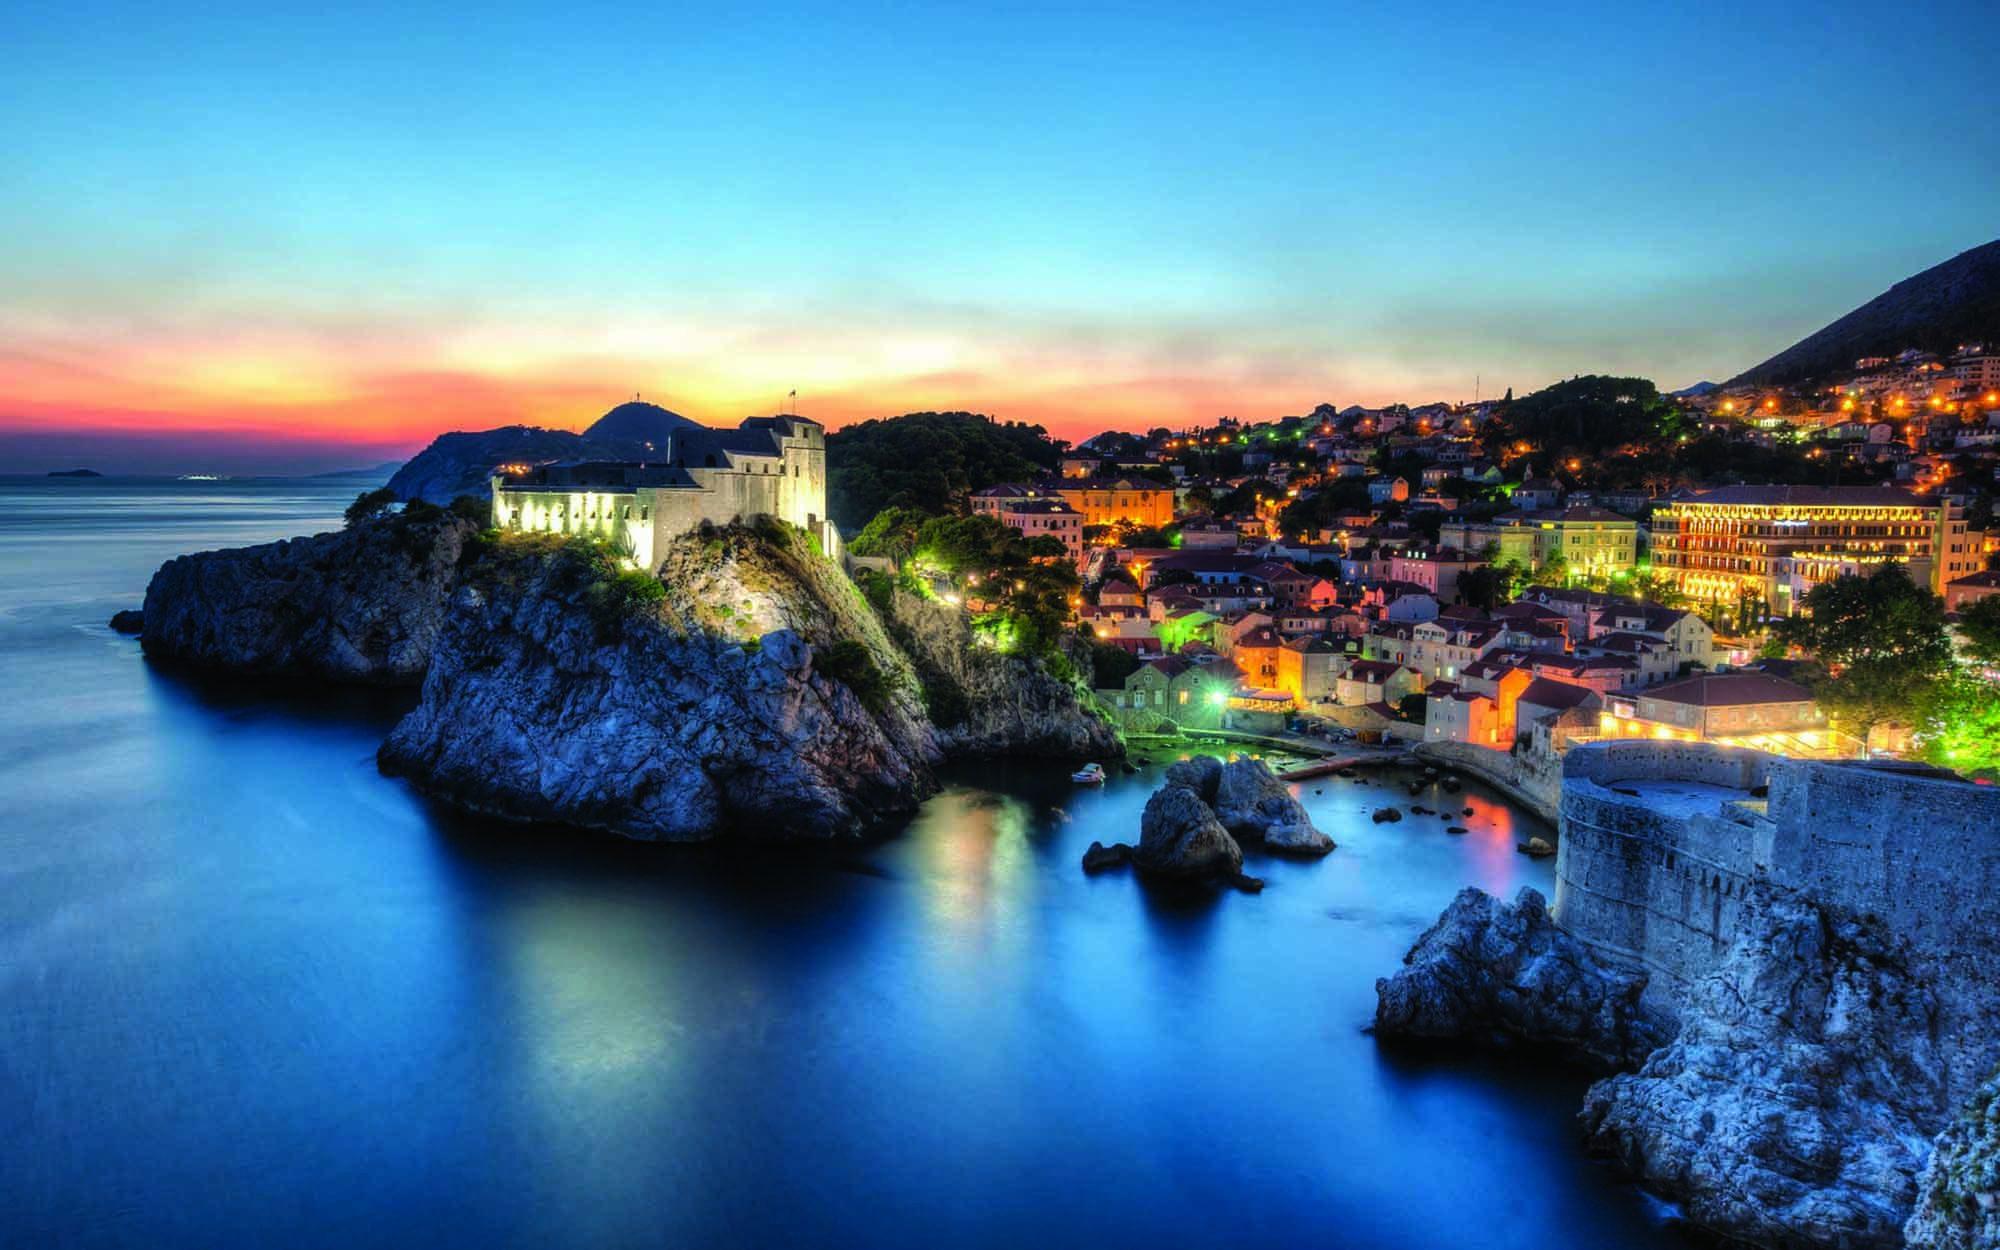 Adriatic Odyssey 2018 Dubrovnik Dubrovnik Cruise Croatia